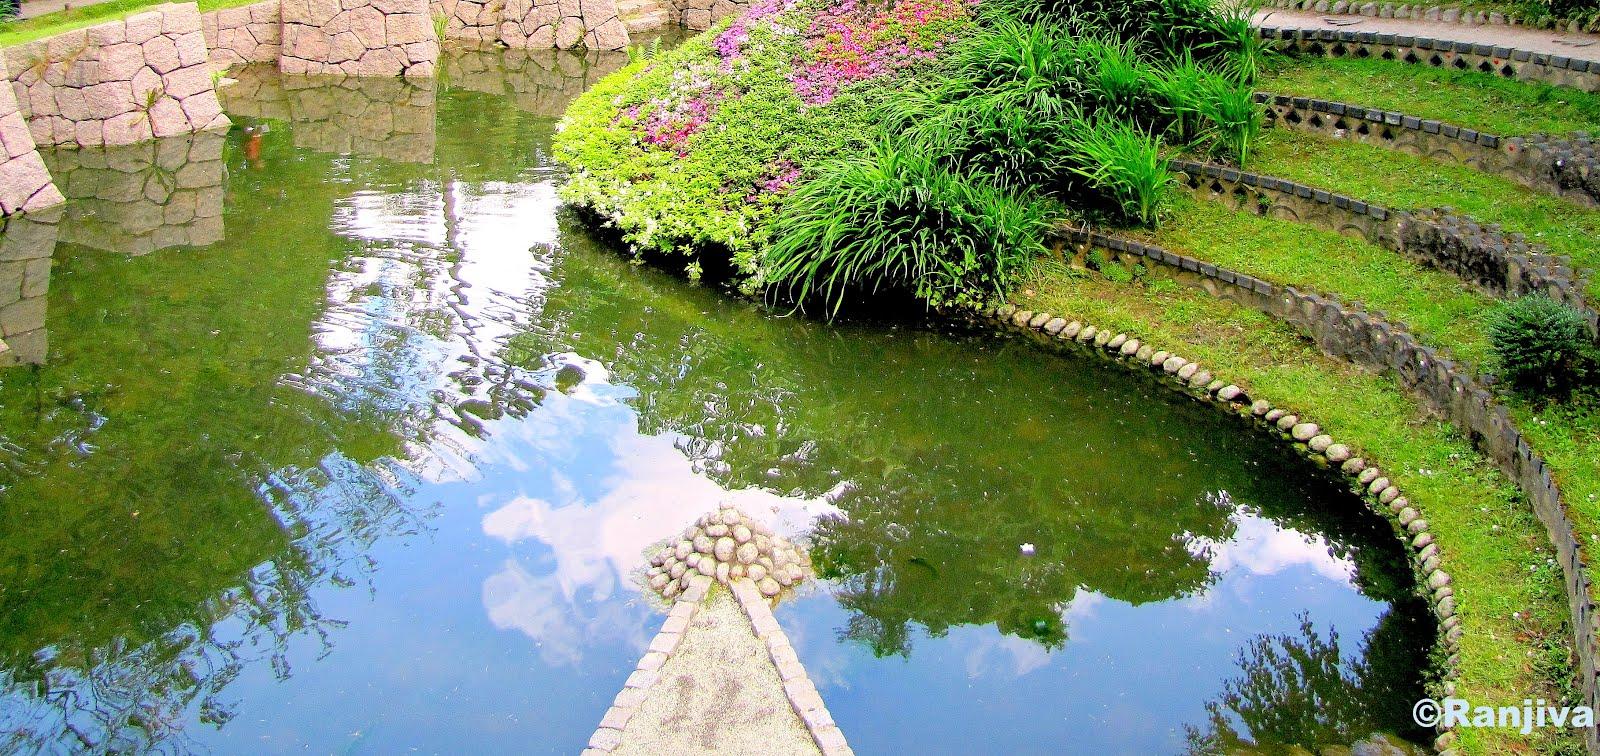 Paisibles jardins d 39 albert kahn paysages et fleurs au for Albert kahn jardin